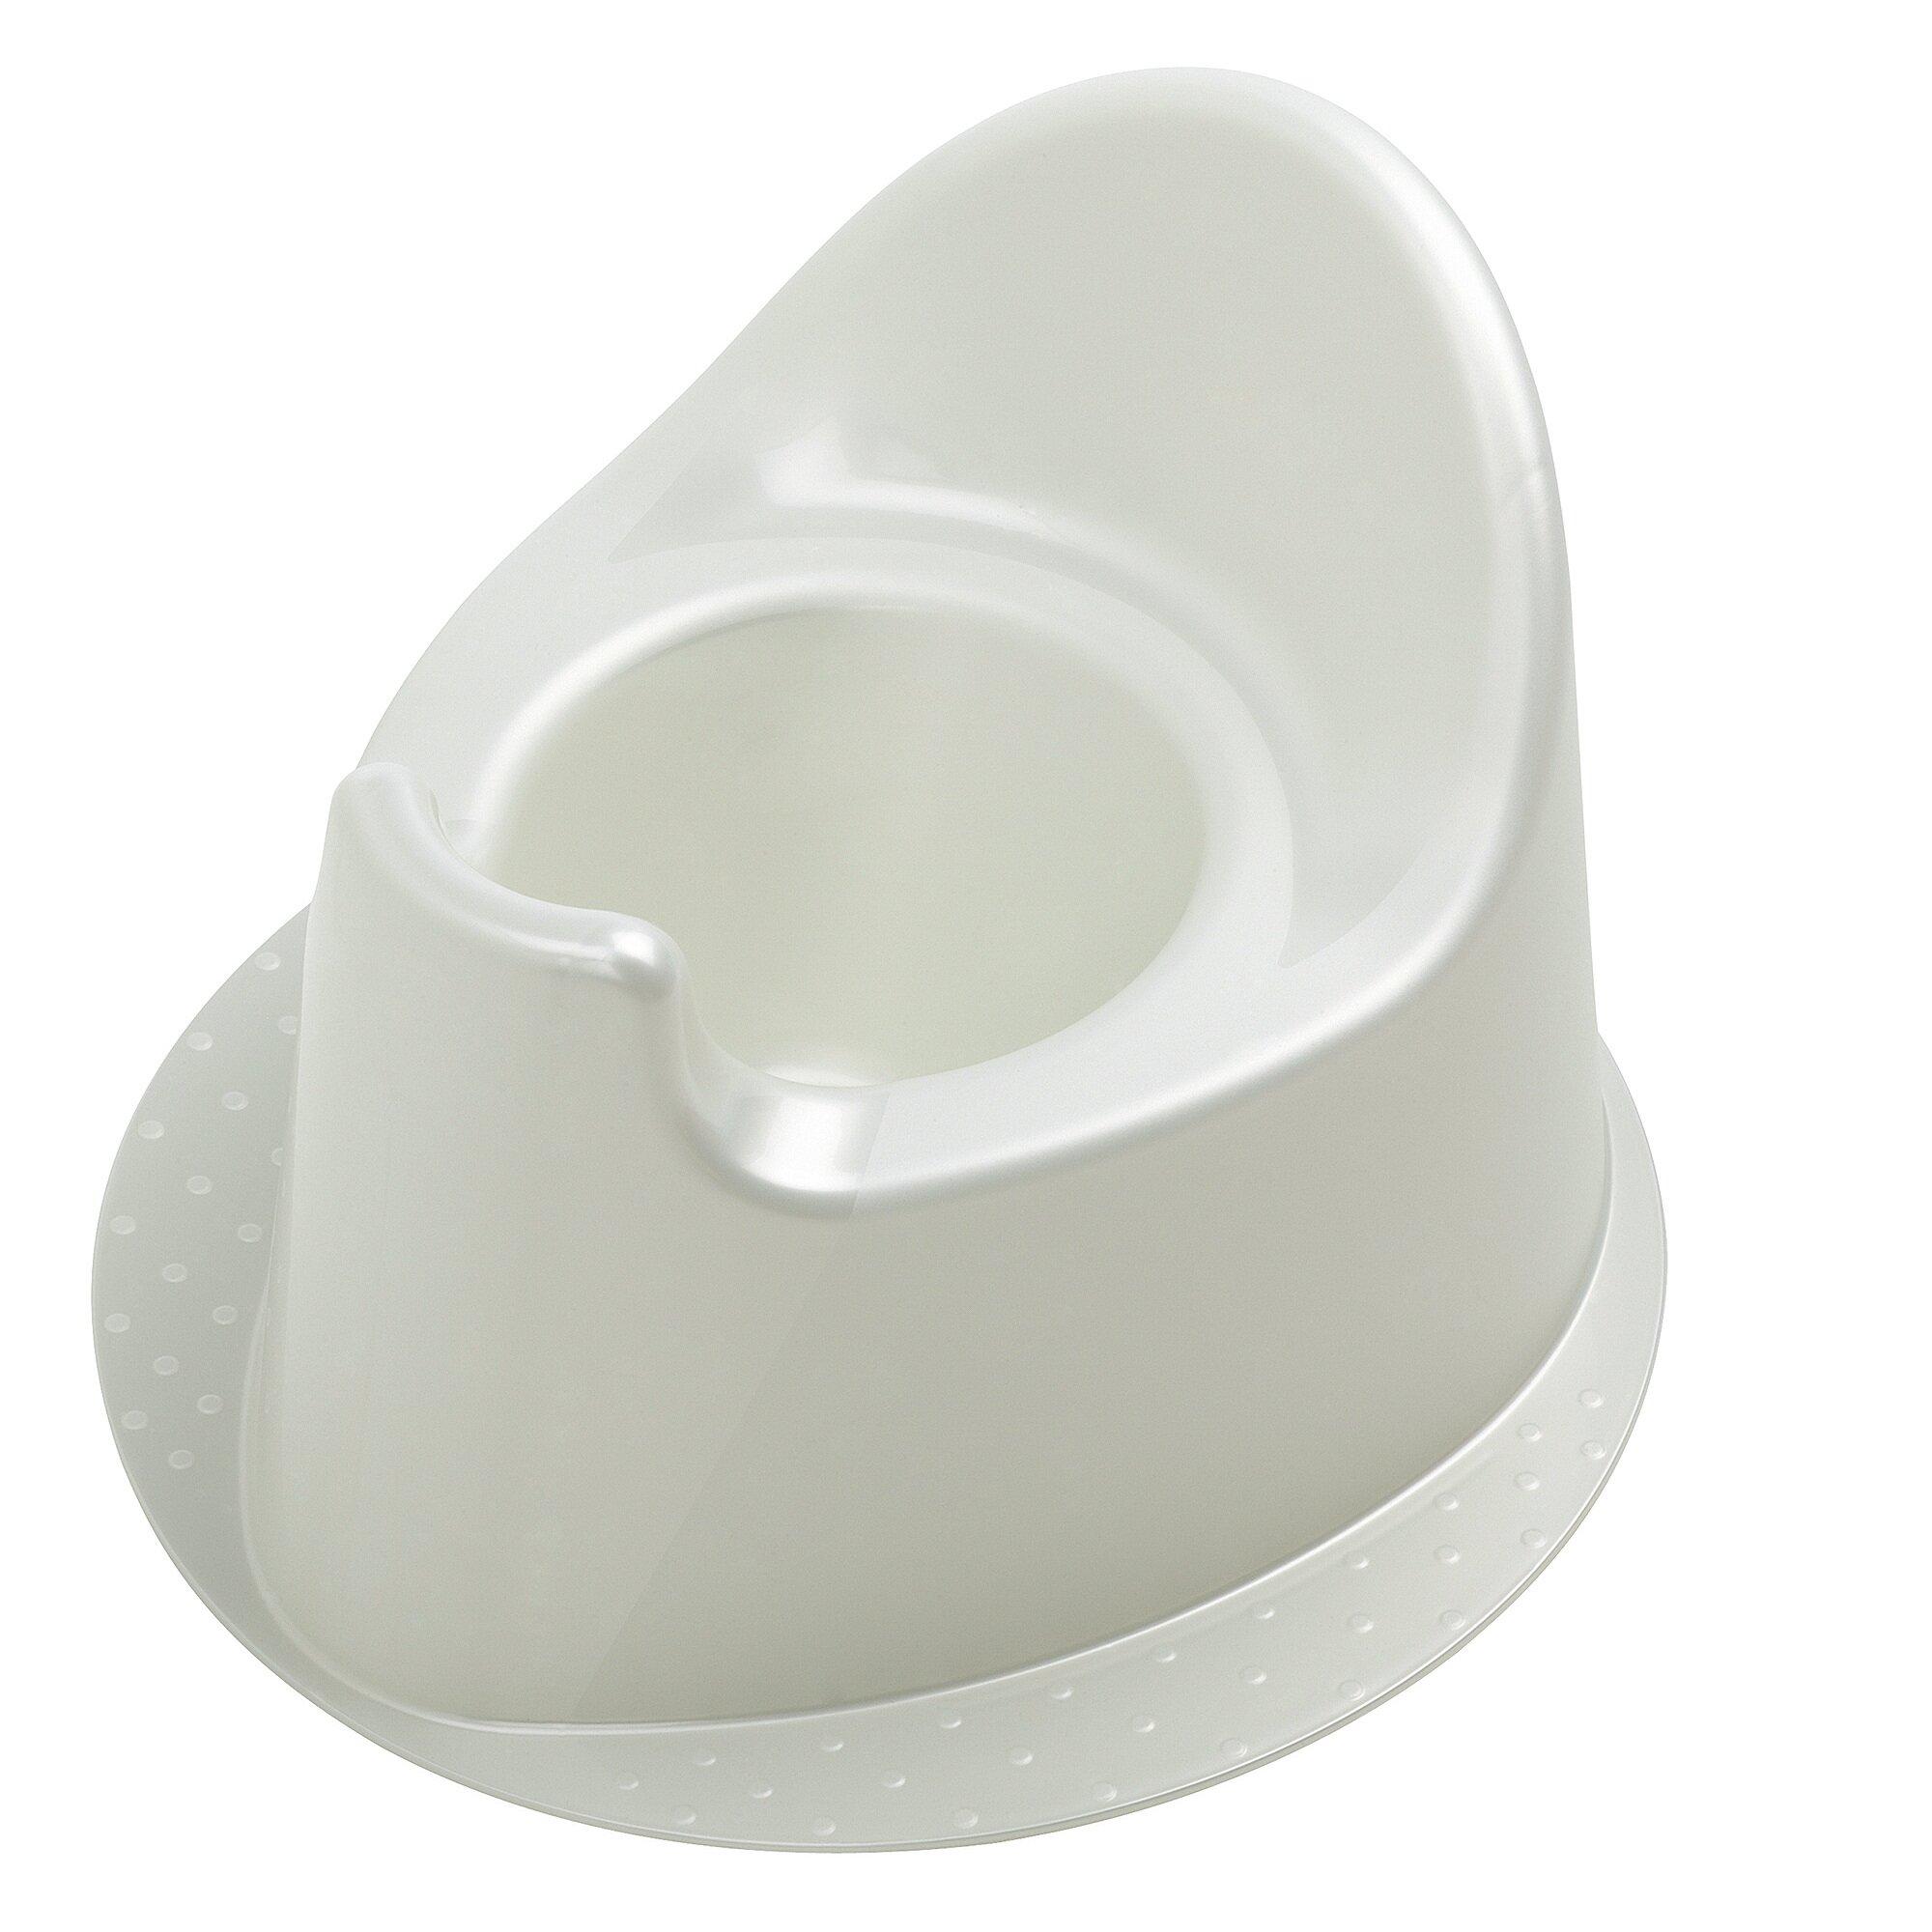 Rotho Babydesign Töpfchen Top